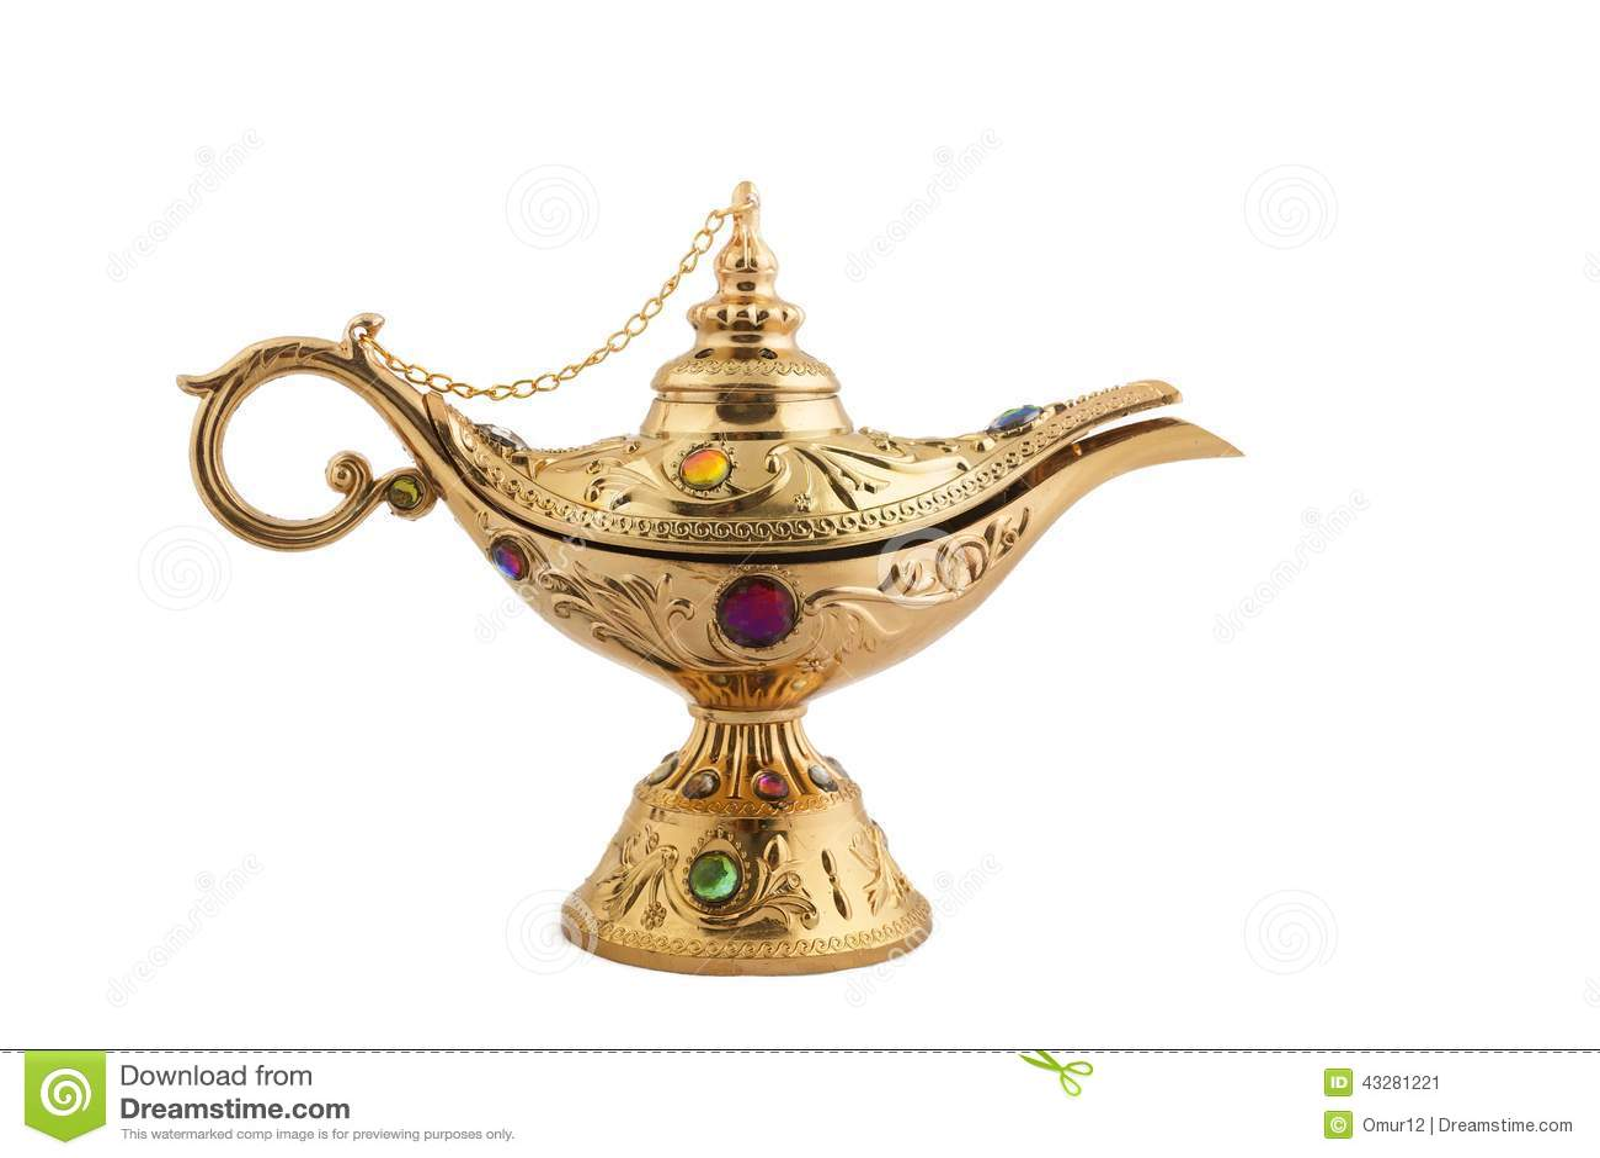 Arabic Oil Lamp Lamp Aladdin Stock Images - 219 Photos for Arabic Oil Lamp  110ylc